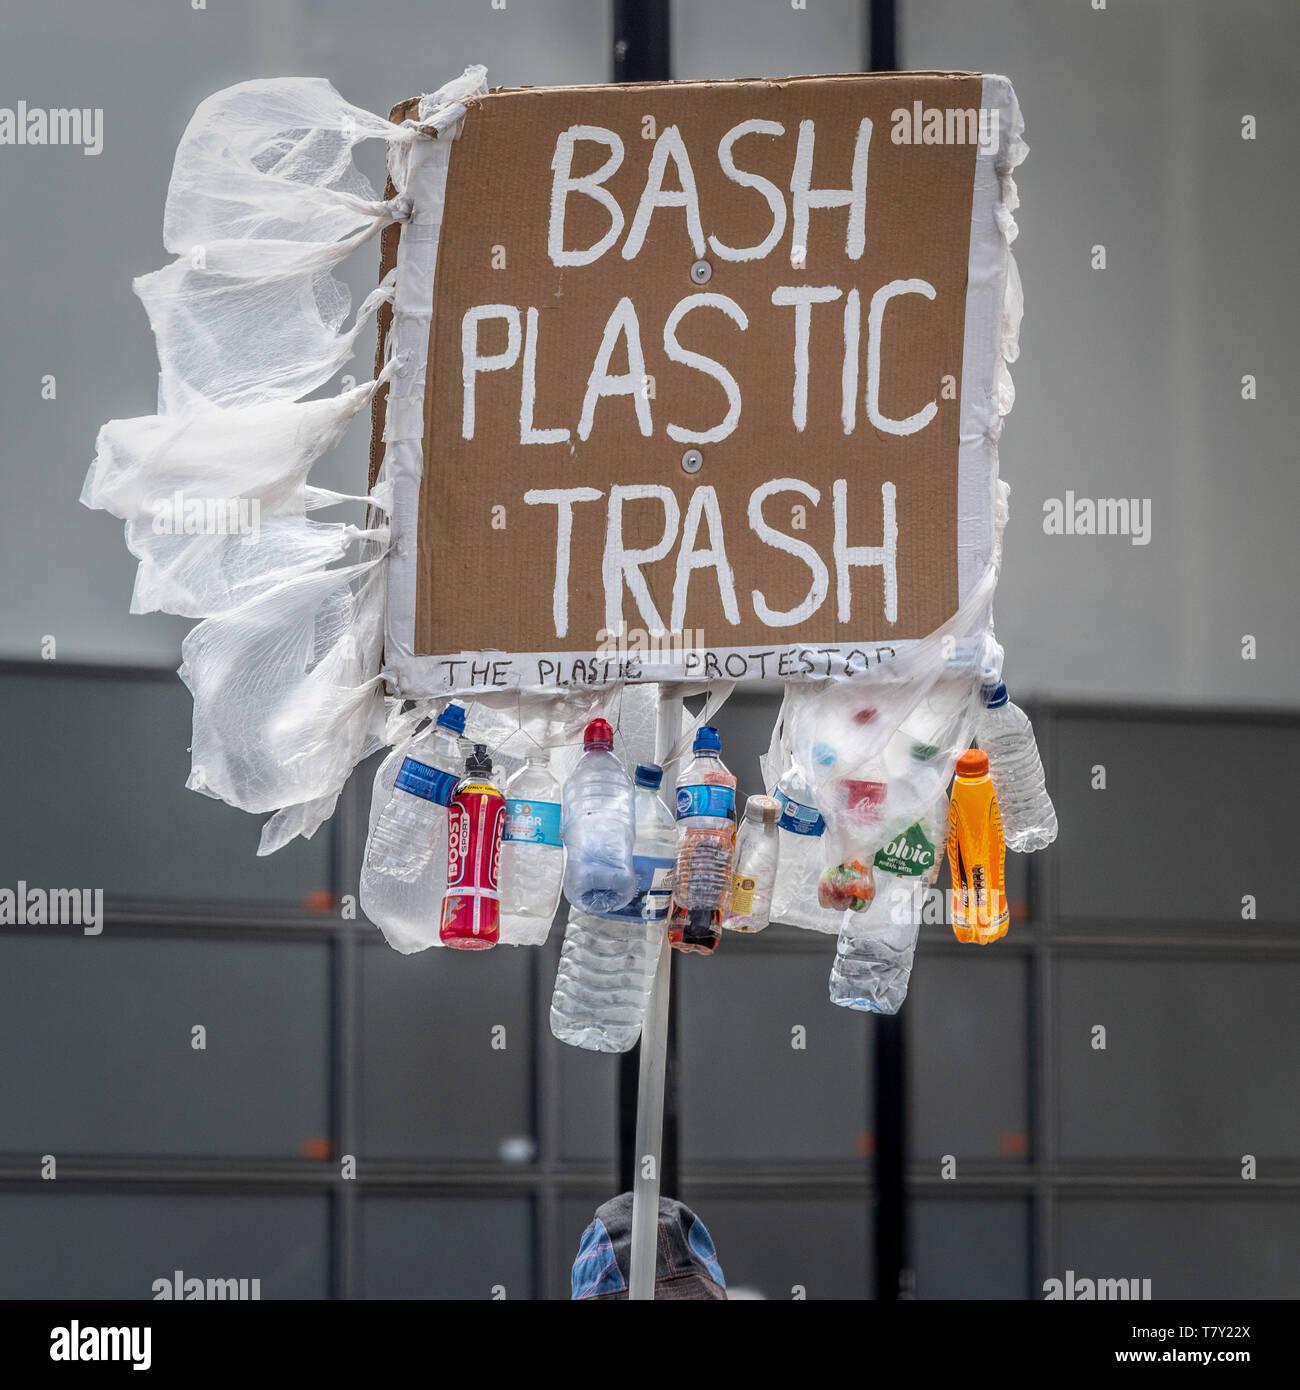 Bash Plastic Trash protester's placard outside Westminster, London, UK. - Stock Image